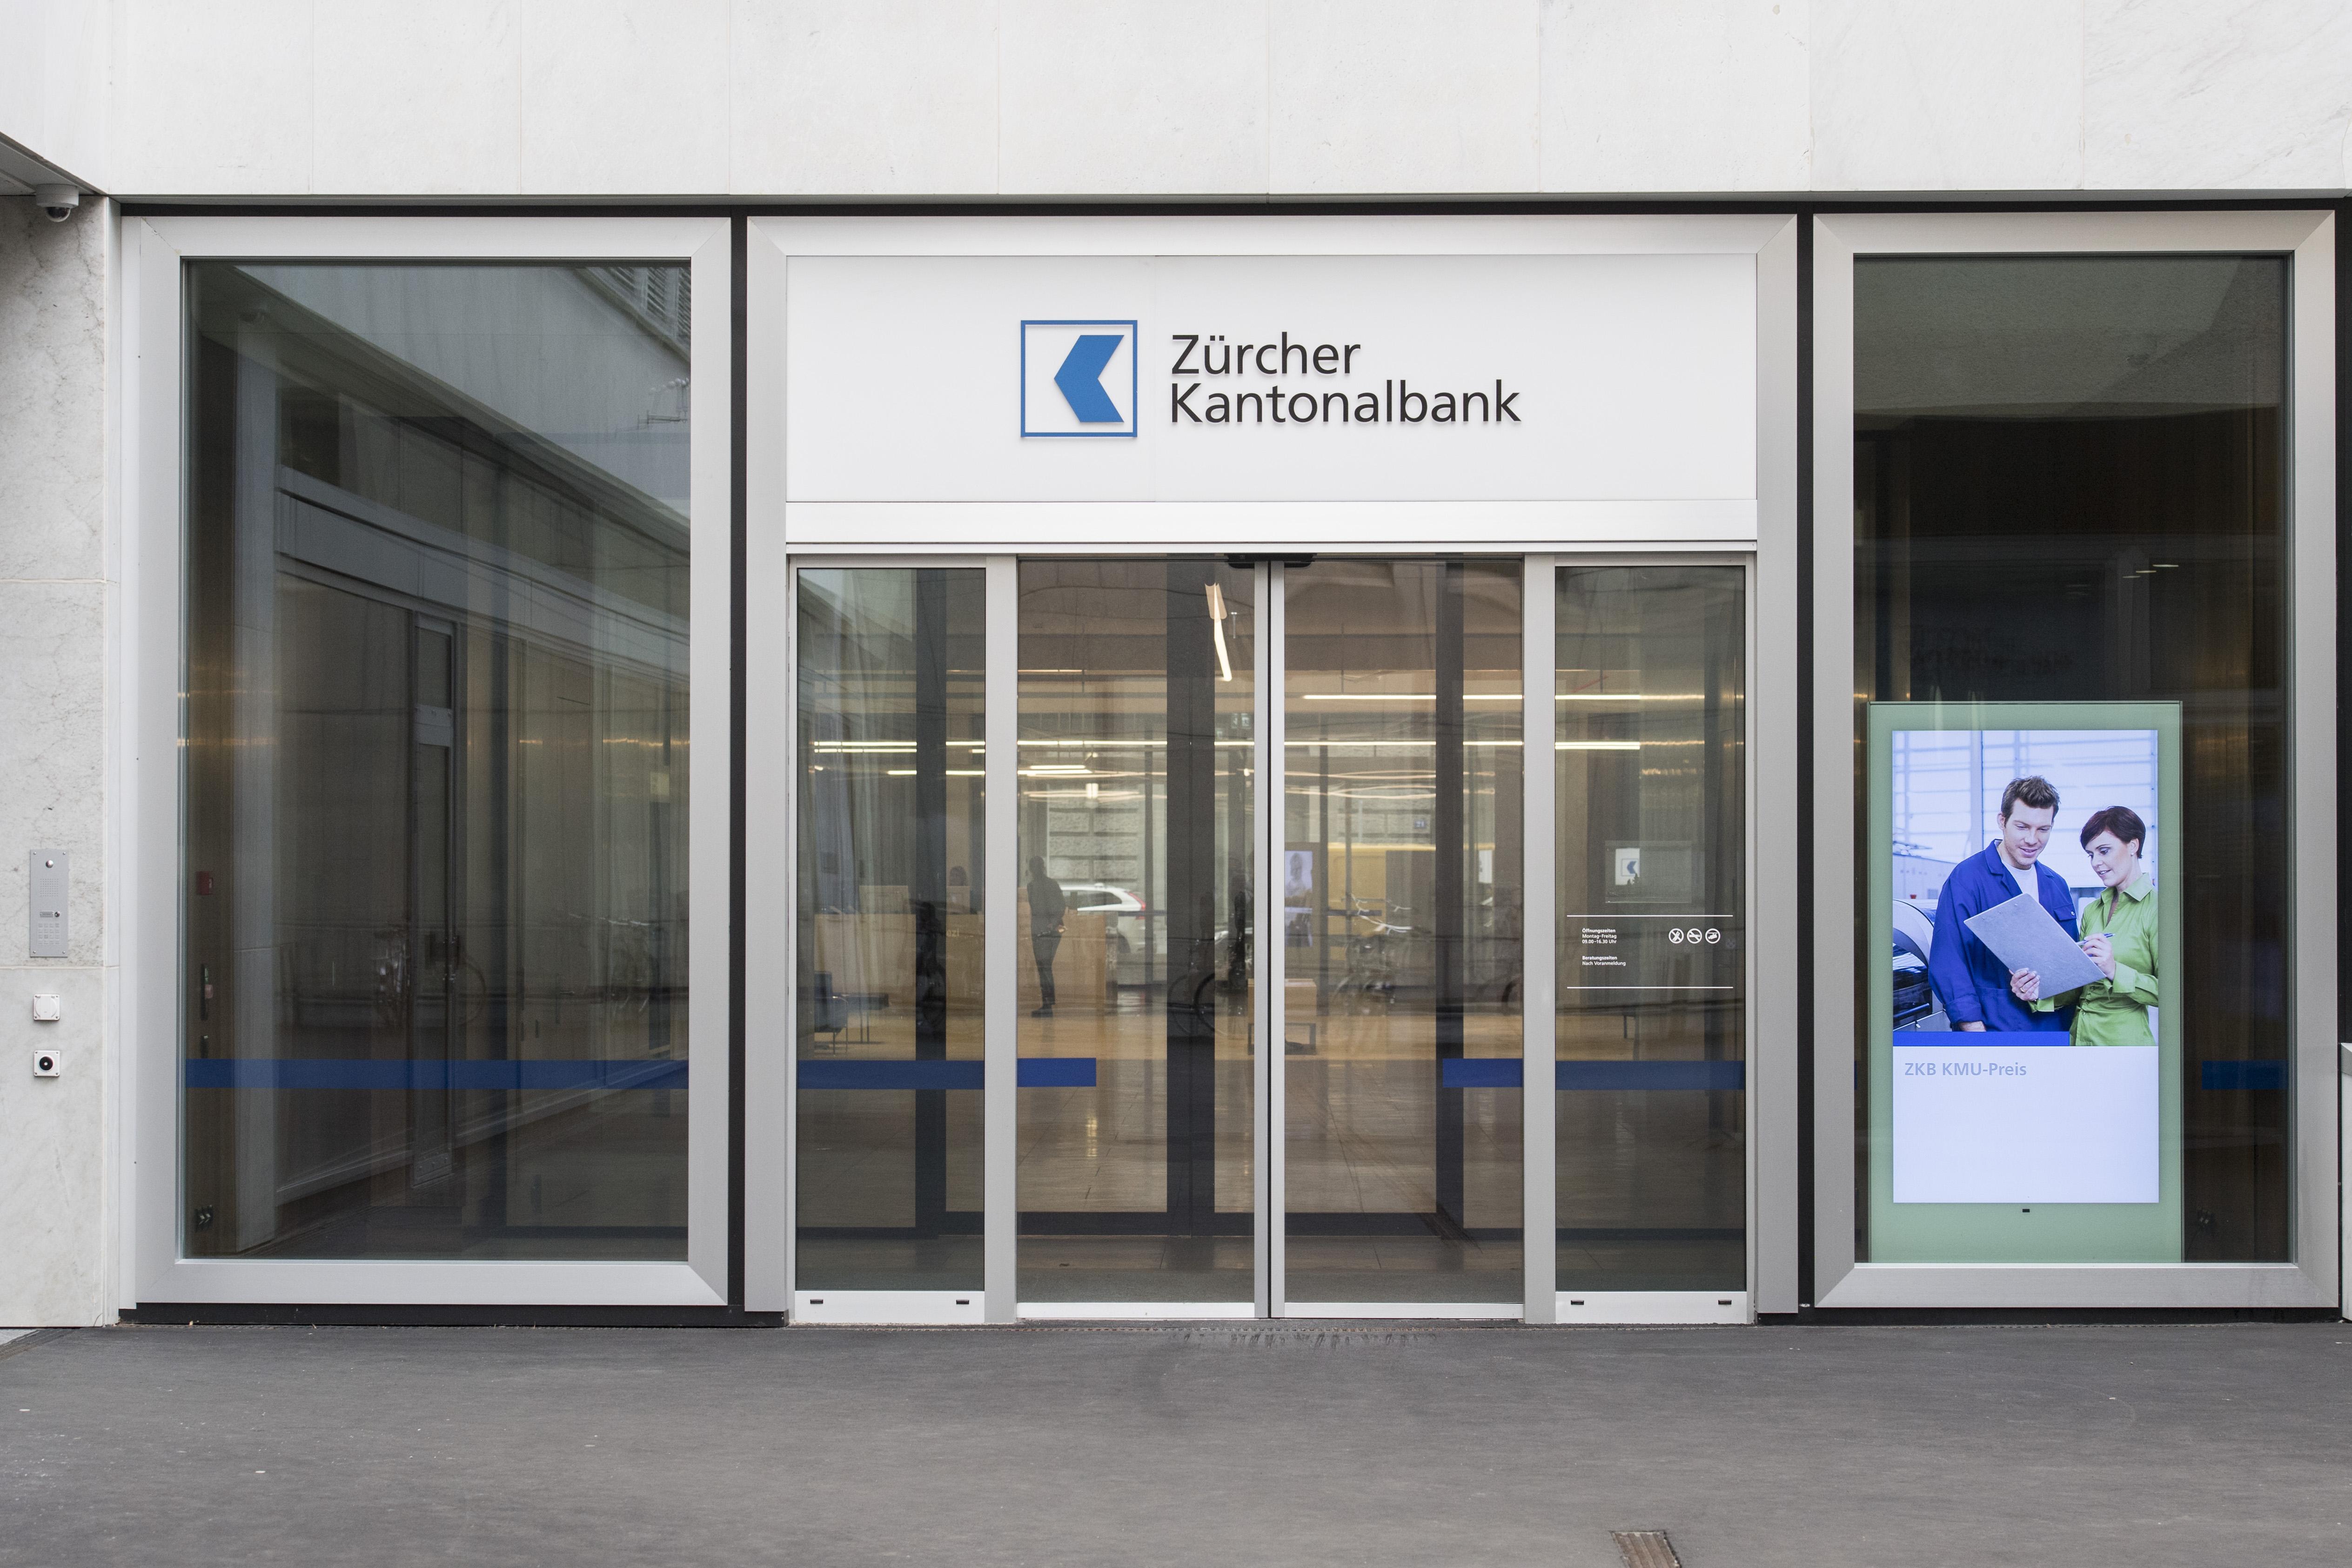 چگونه سیگار بسازیم zrcher kantonalbank | عکس ایمگور